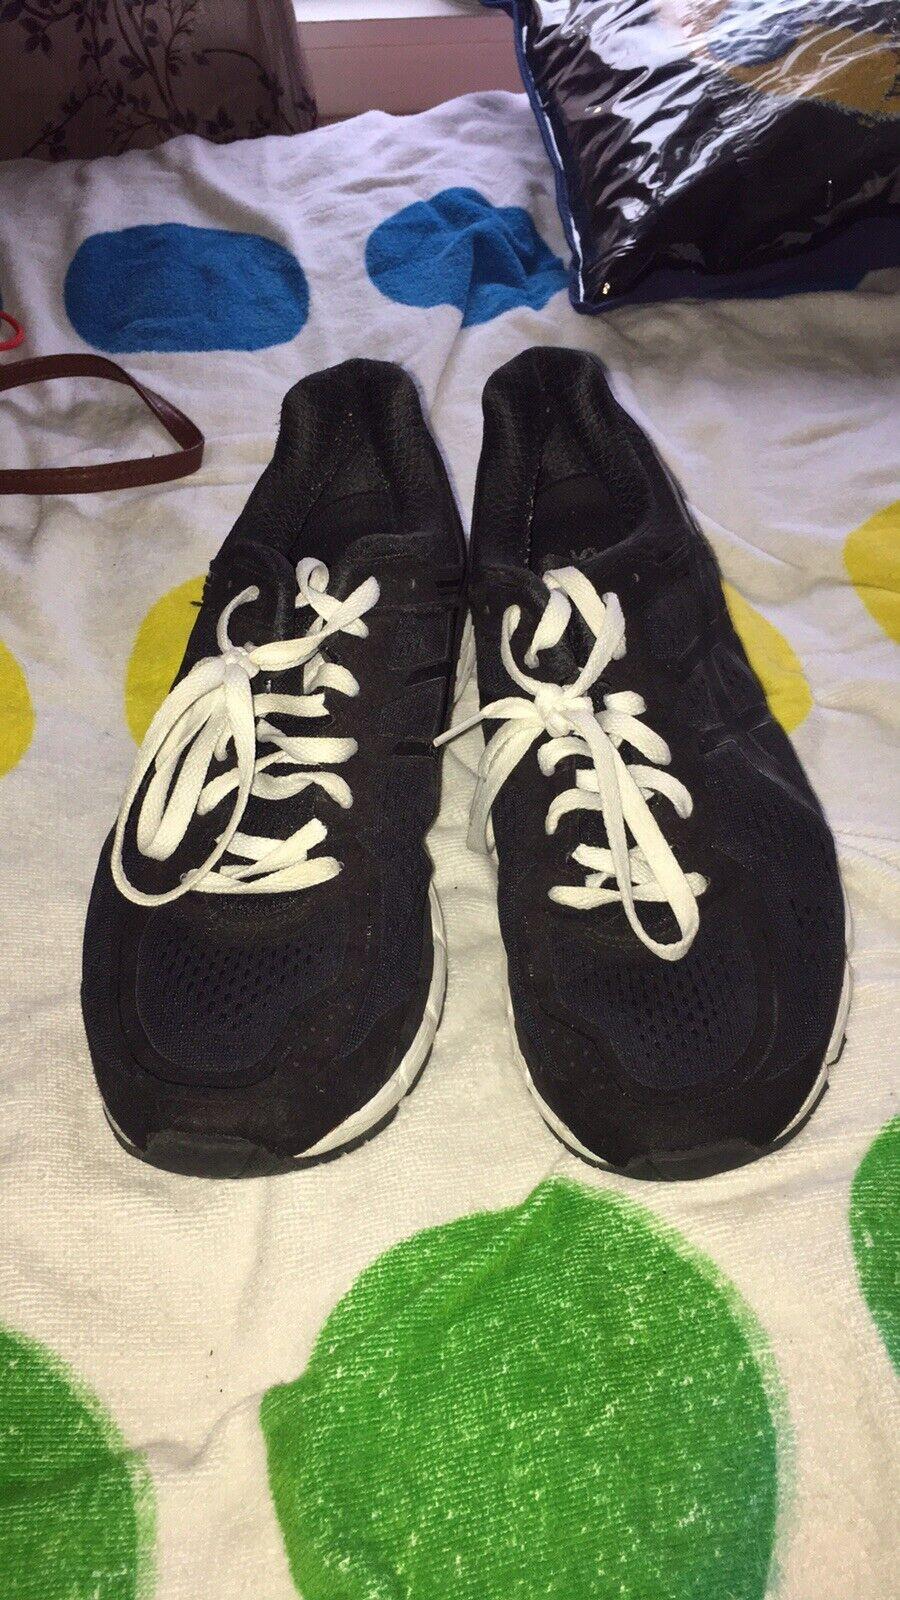 Asics Gel Kayano 22 mens athletic schuhe Größe 12